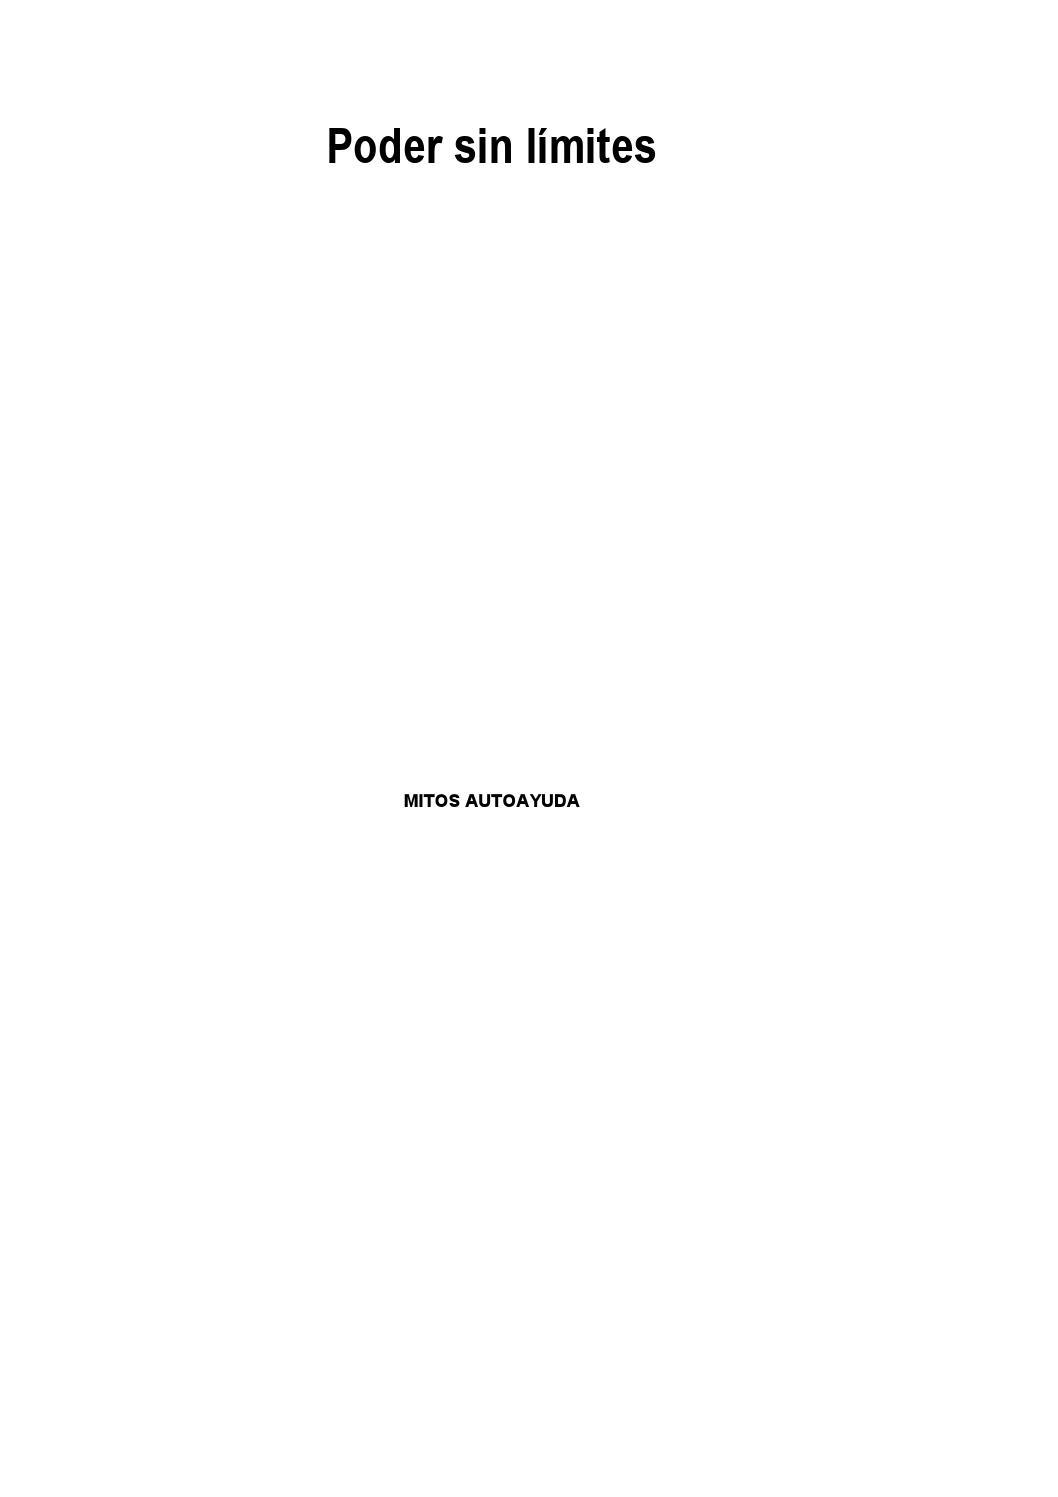 Poder sin limites anthony robbins by Jose Humberto Herrera Avila - issuu